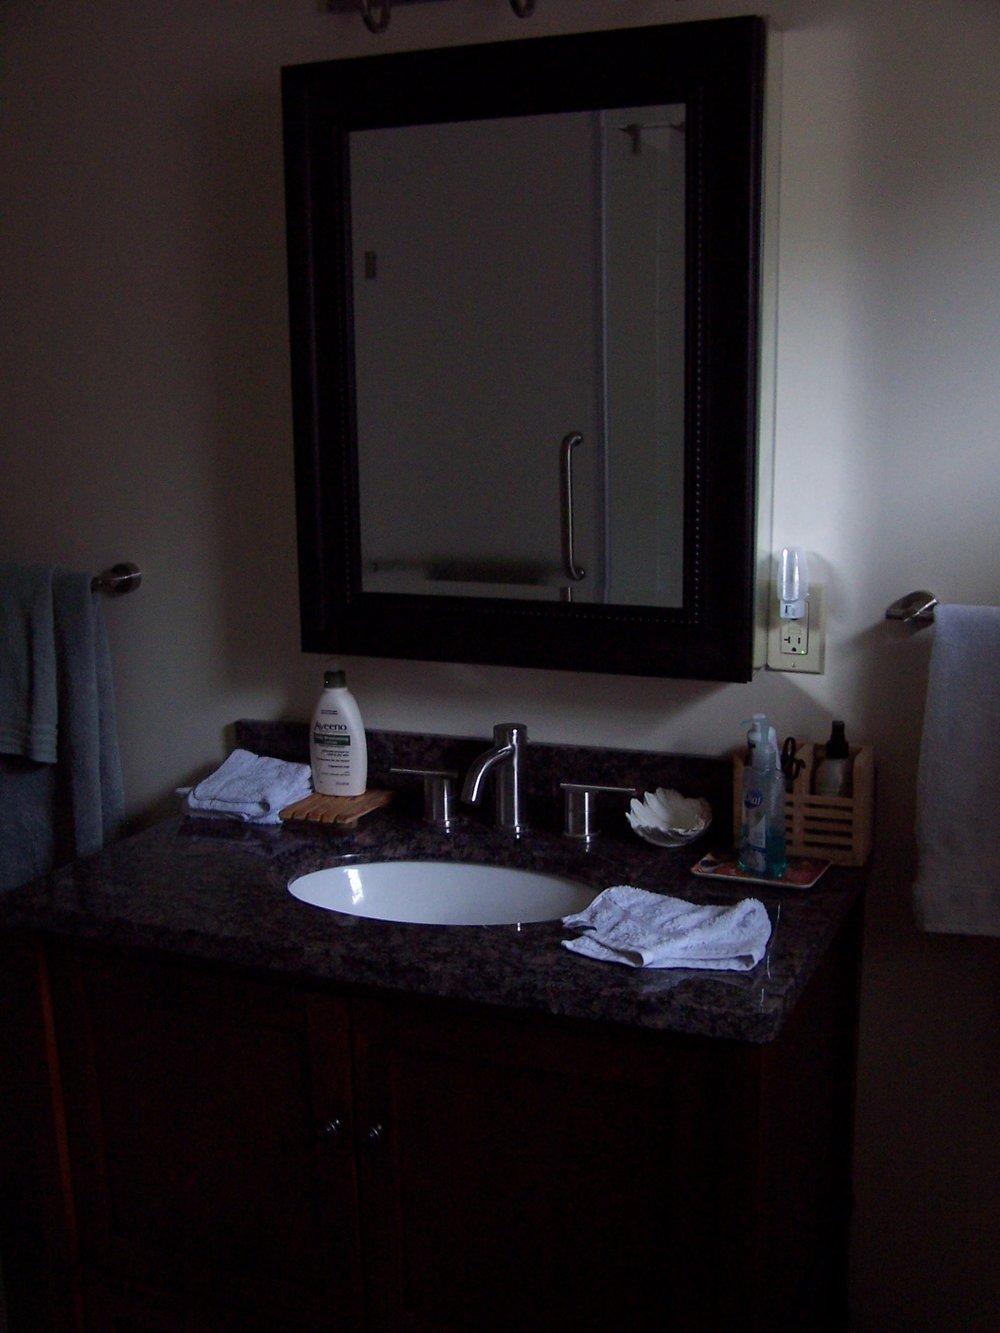 Craig 627 Silver Bathroom Downstairs 2.JPG